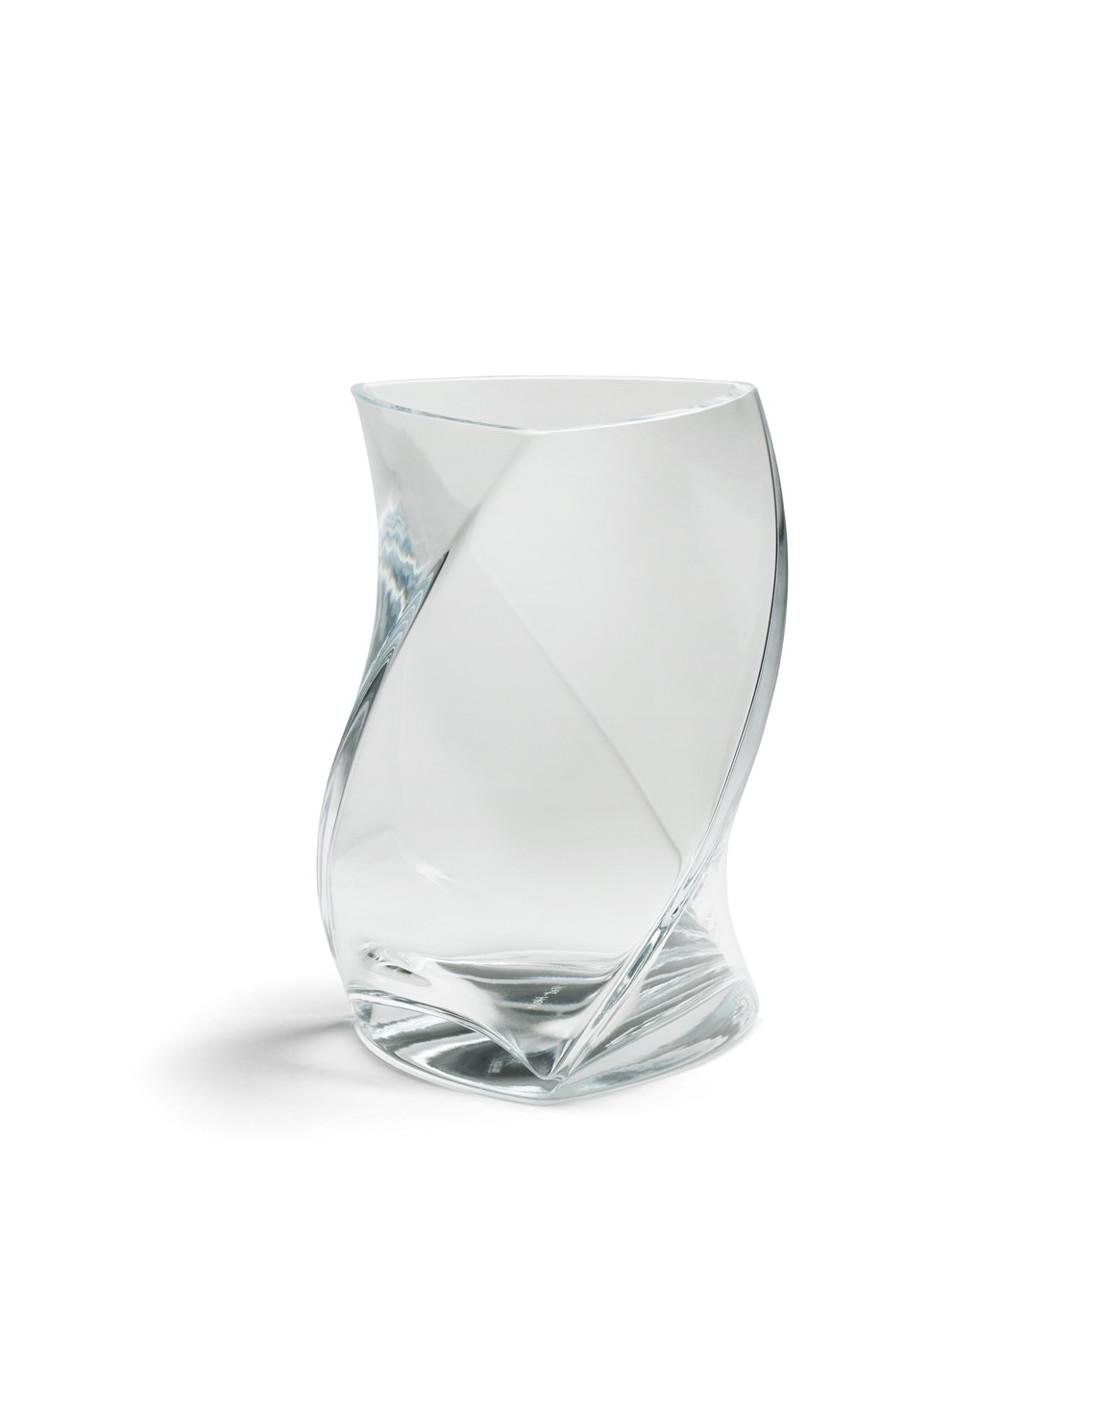 grand vase twister piet hein. Black Bedroom Furniture Sets. Home Design Ideas